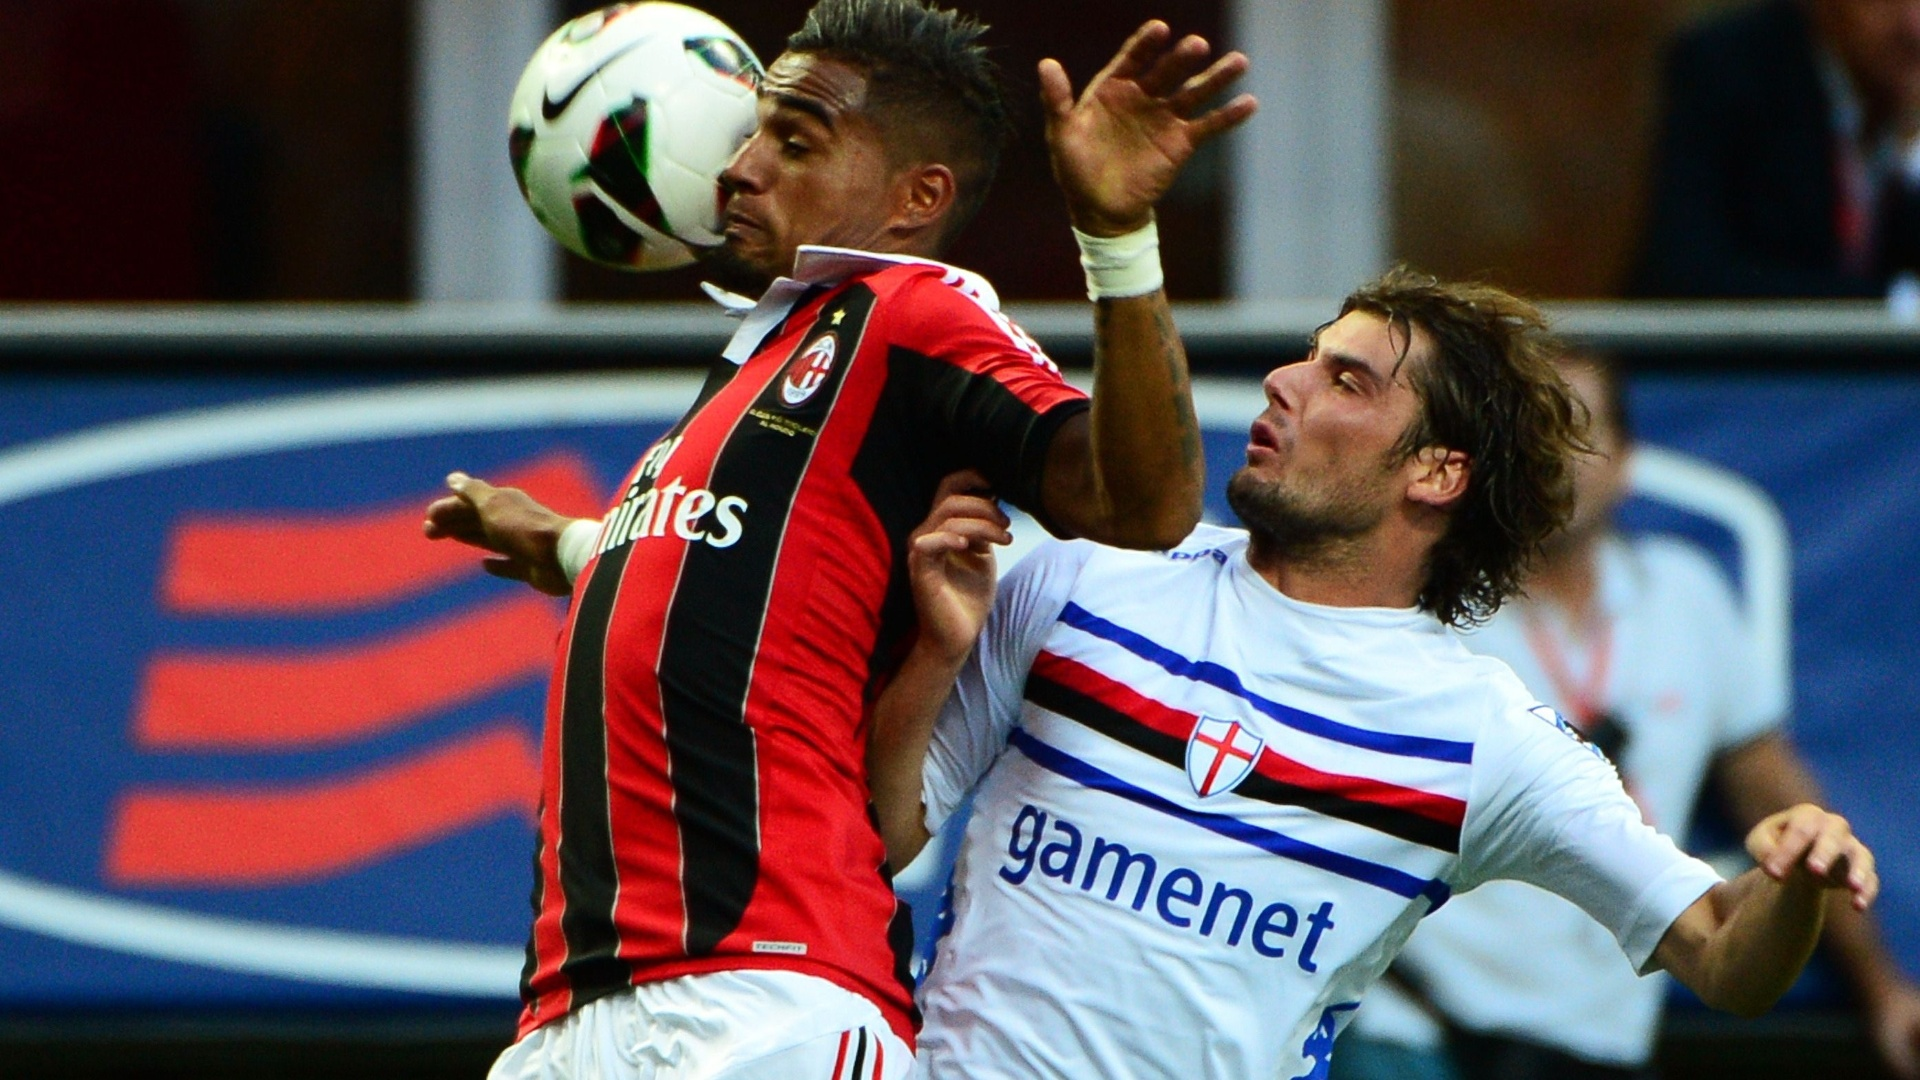 Boateng, que assumiu a camisa 10 do Milan após a saída de Seedorf, é marcado pelo zagueiro italiano Massimo Volta